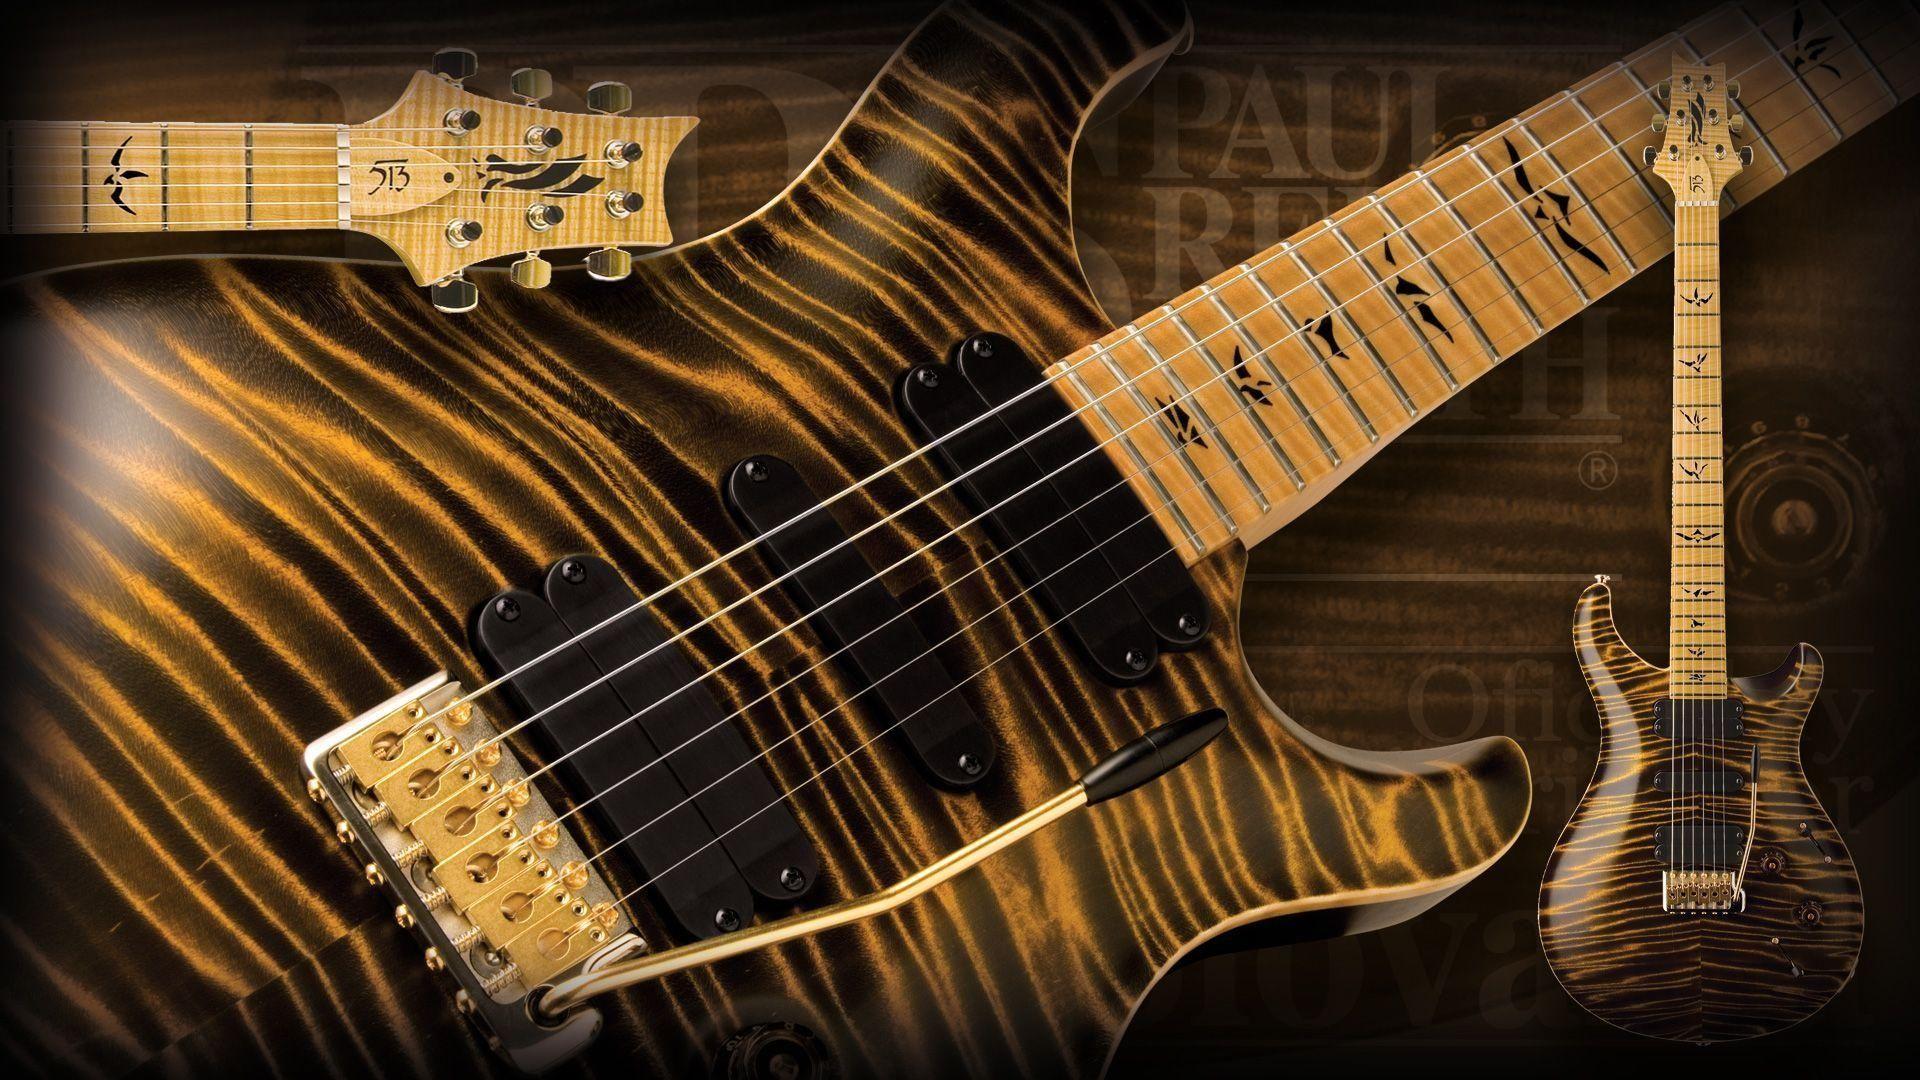 Electric Guitar, HD Wallpaper